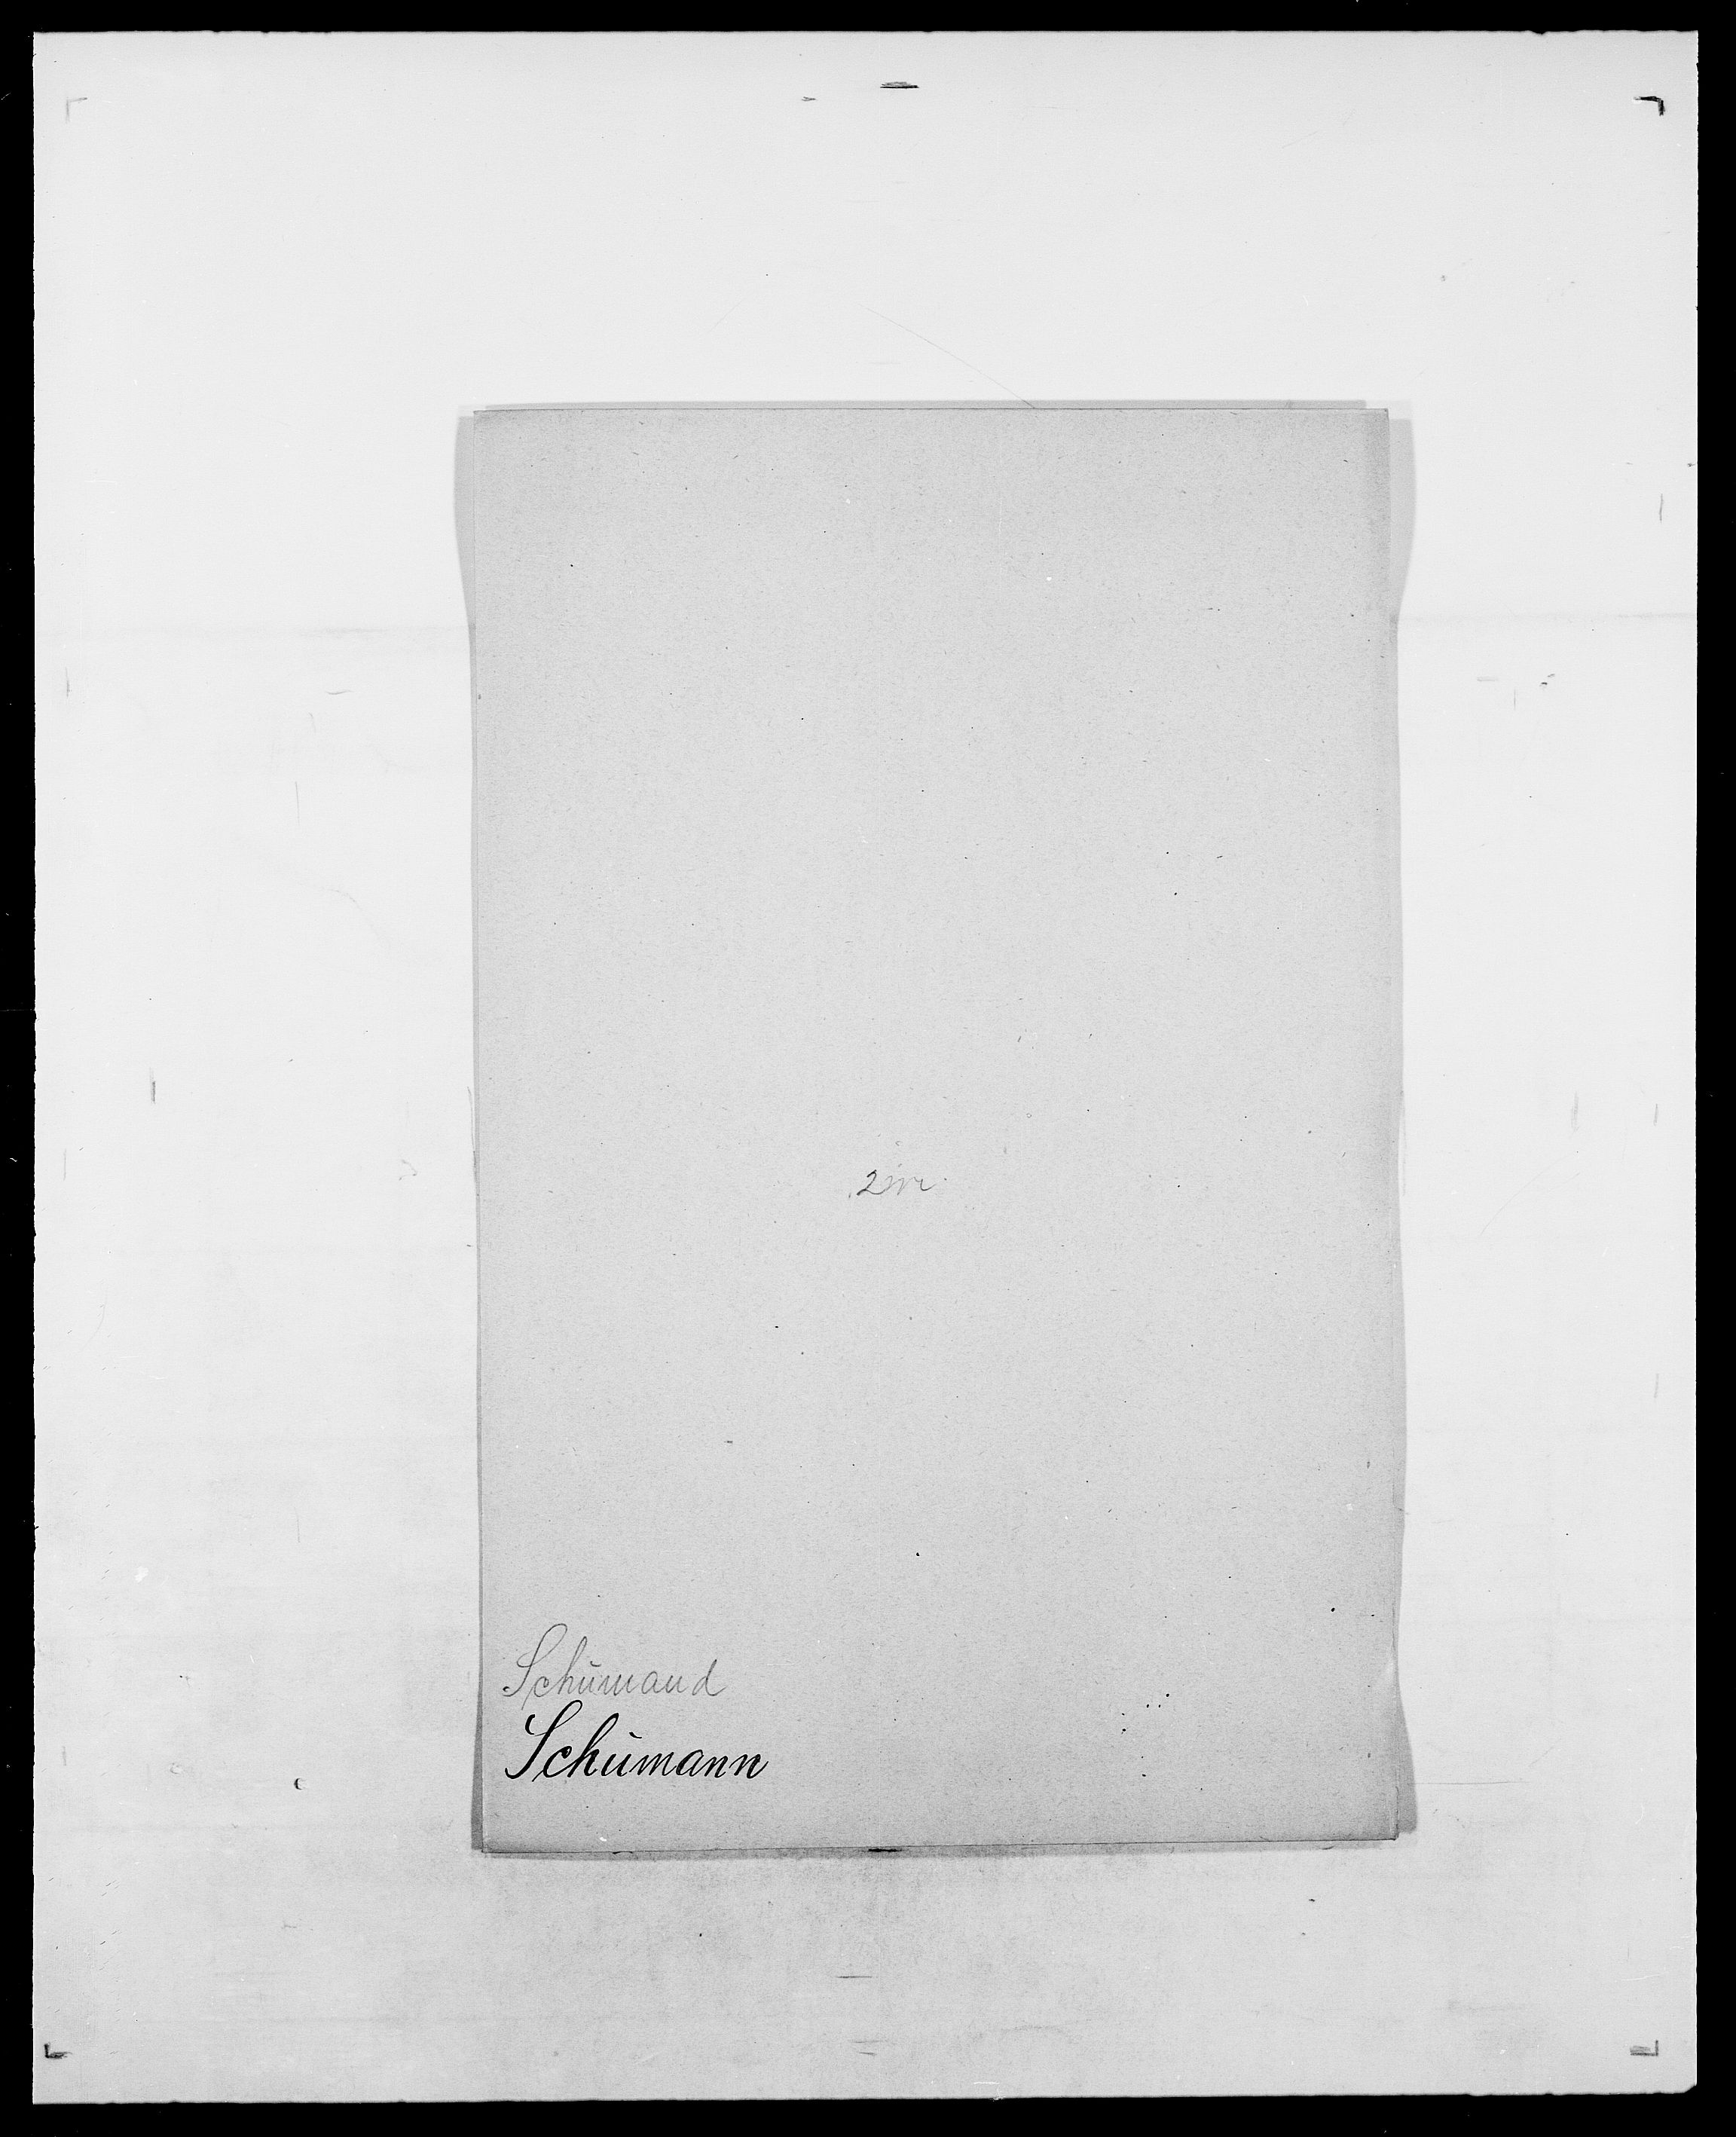 SAO, Delgobe, Charles Antoine - samling, D/Da/L0035: Schnabel - sjetman, s. 355